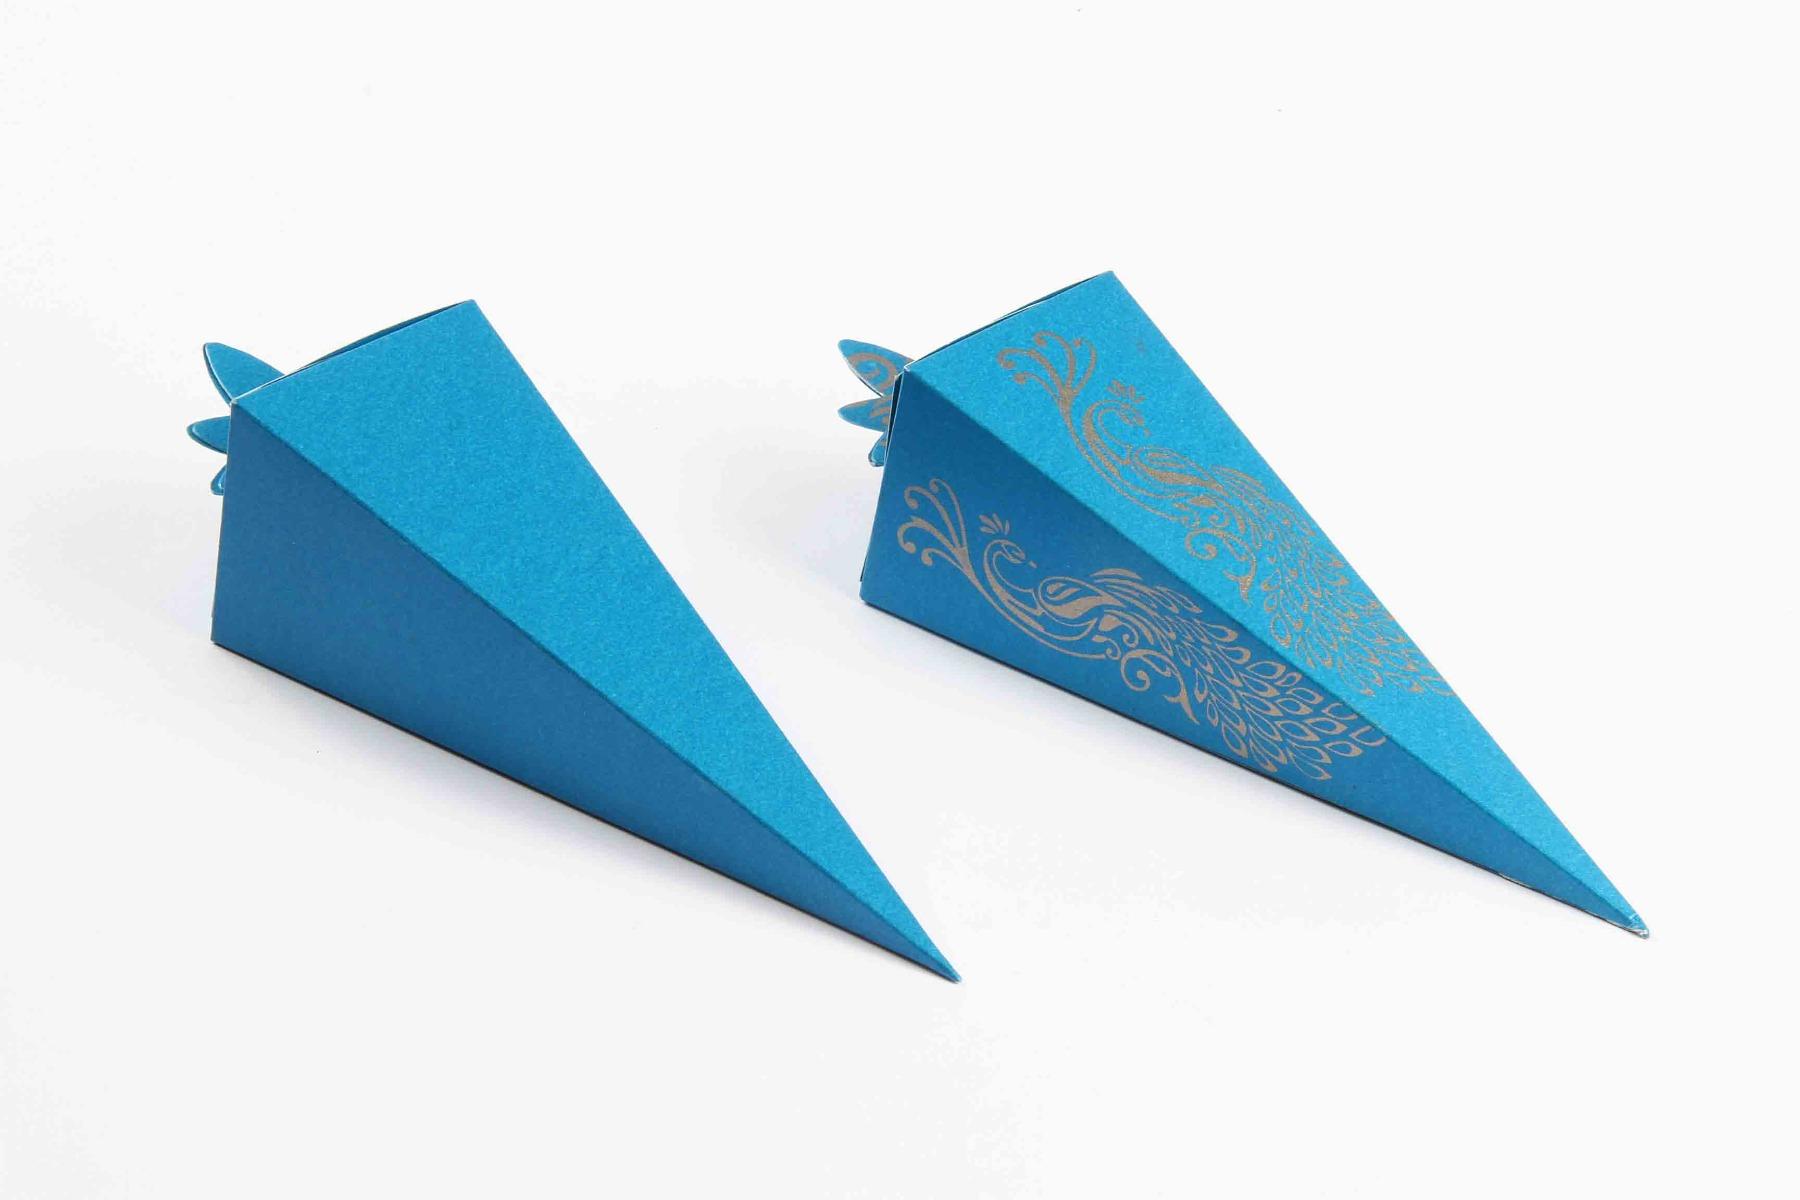 Cone Shaped Favor Box No 8 - Firoze Blue-8624